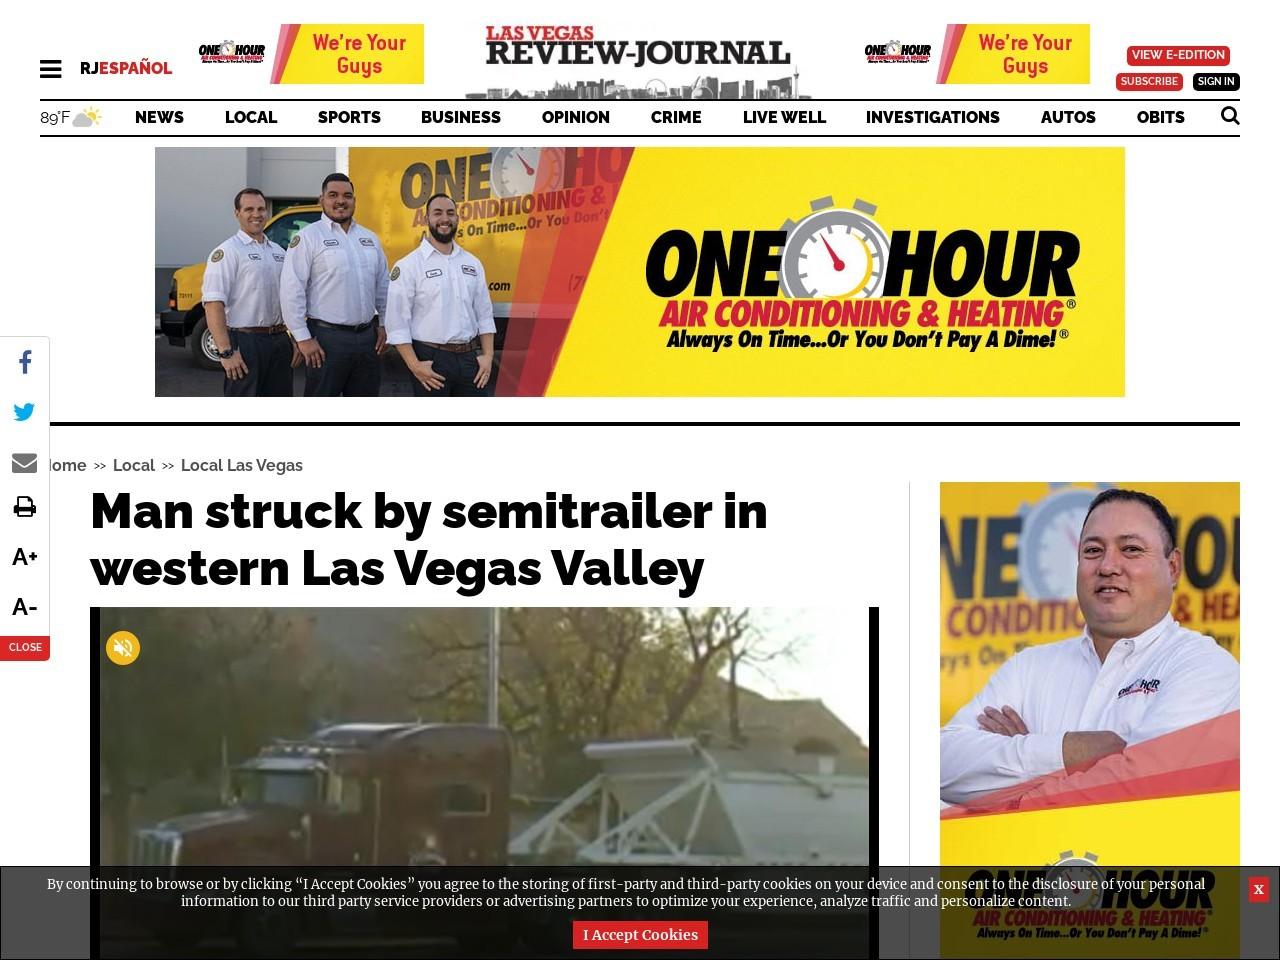 Man struck by vehicle in western Las Vegas Valley